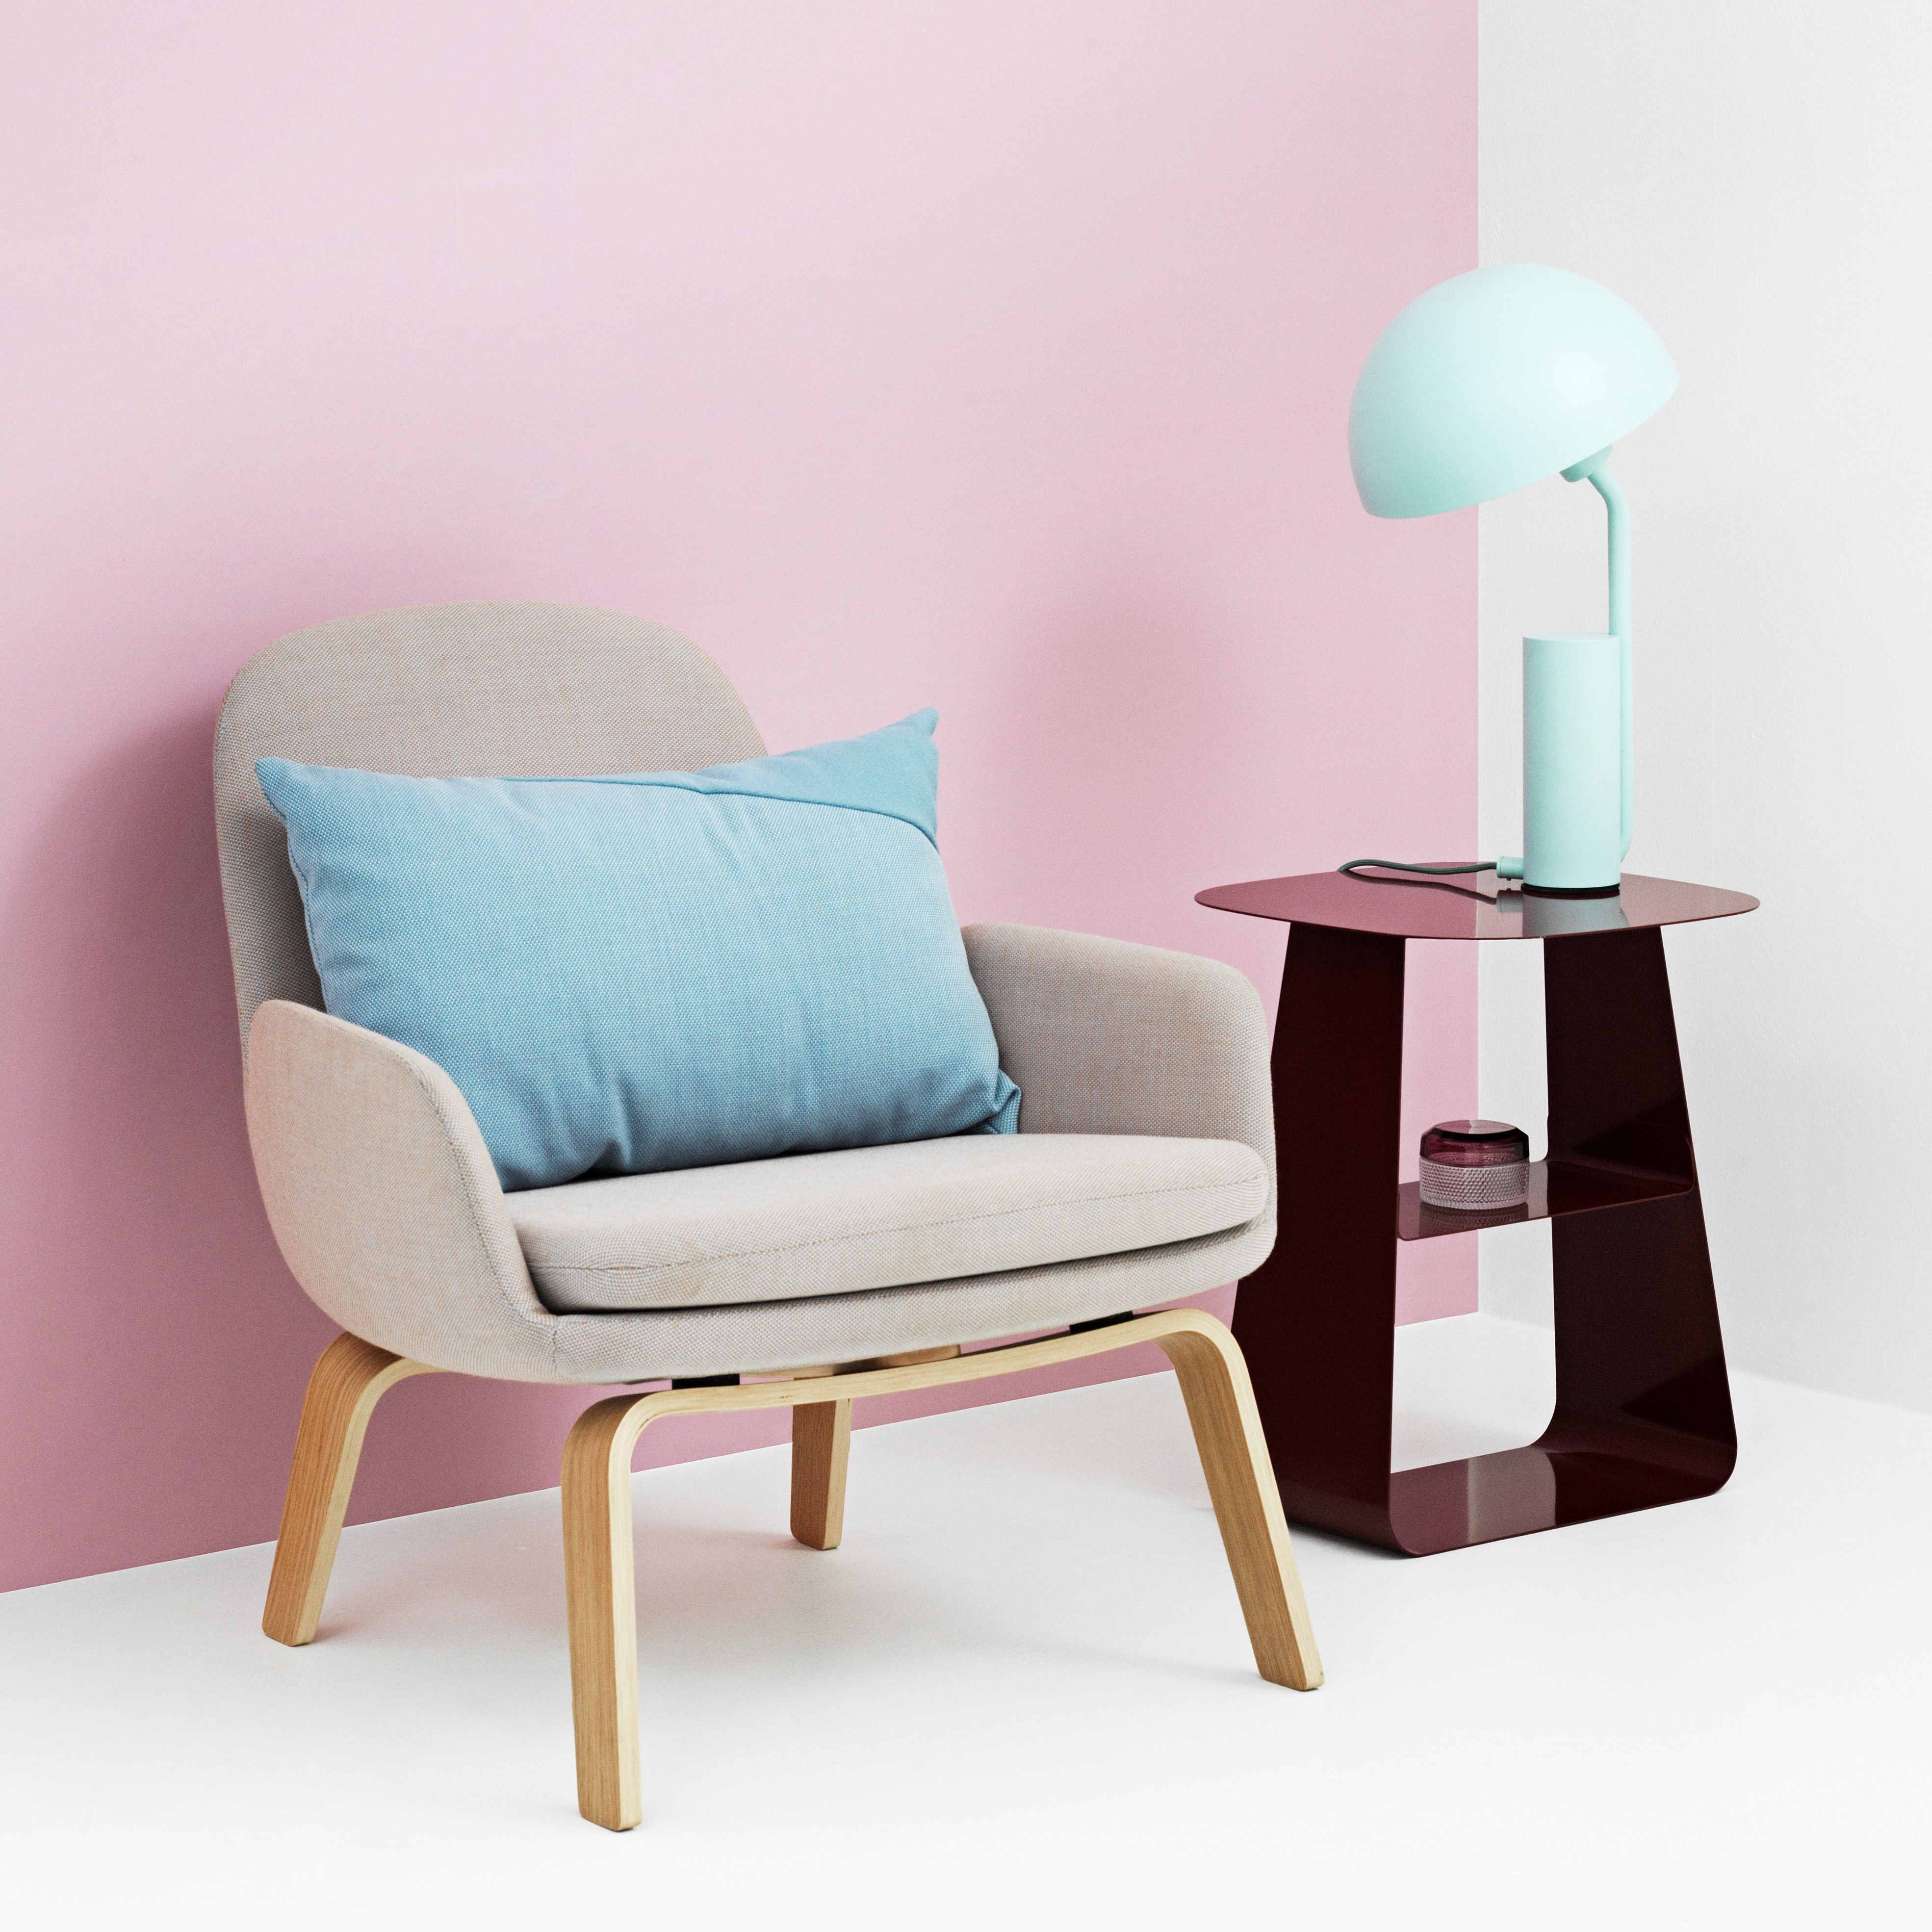 Ideen Fur Leseecke Pastellfarben: Massiv